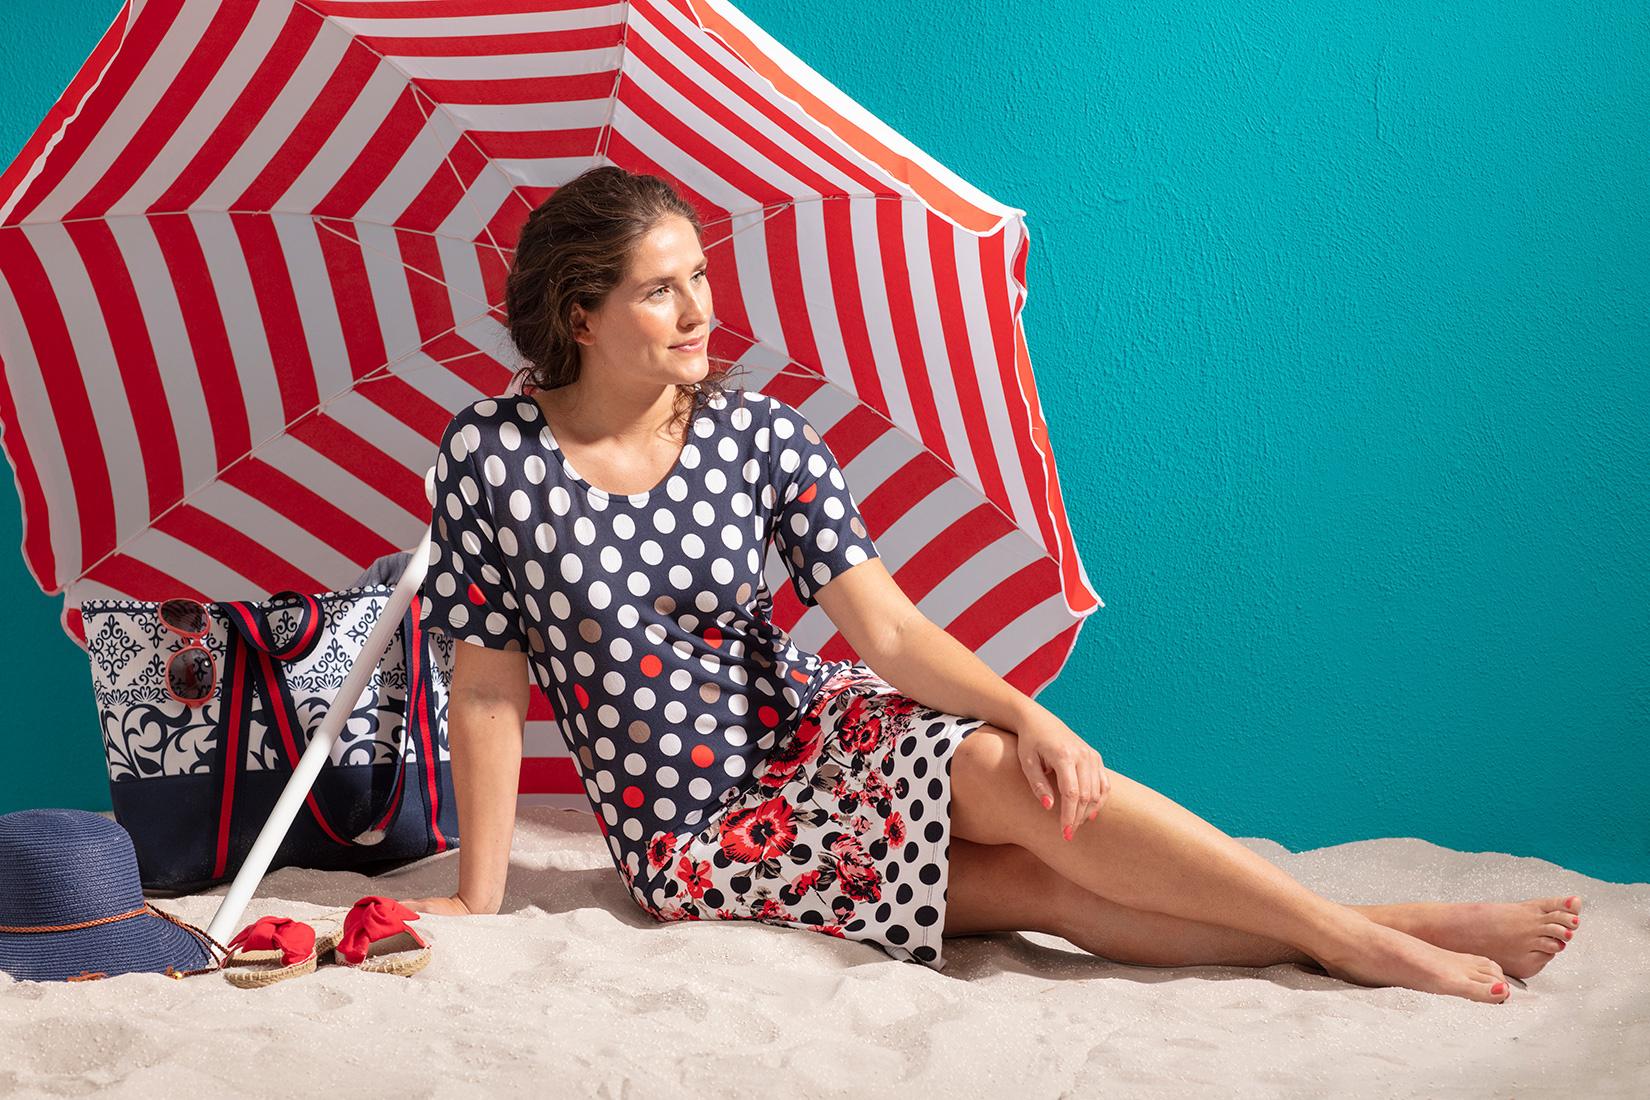 Pastunette Beach strandjurk met korte mouwen 'fashion & flowers'